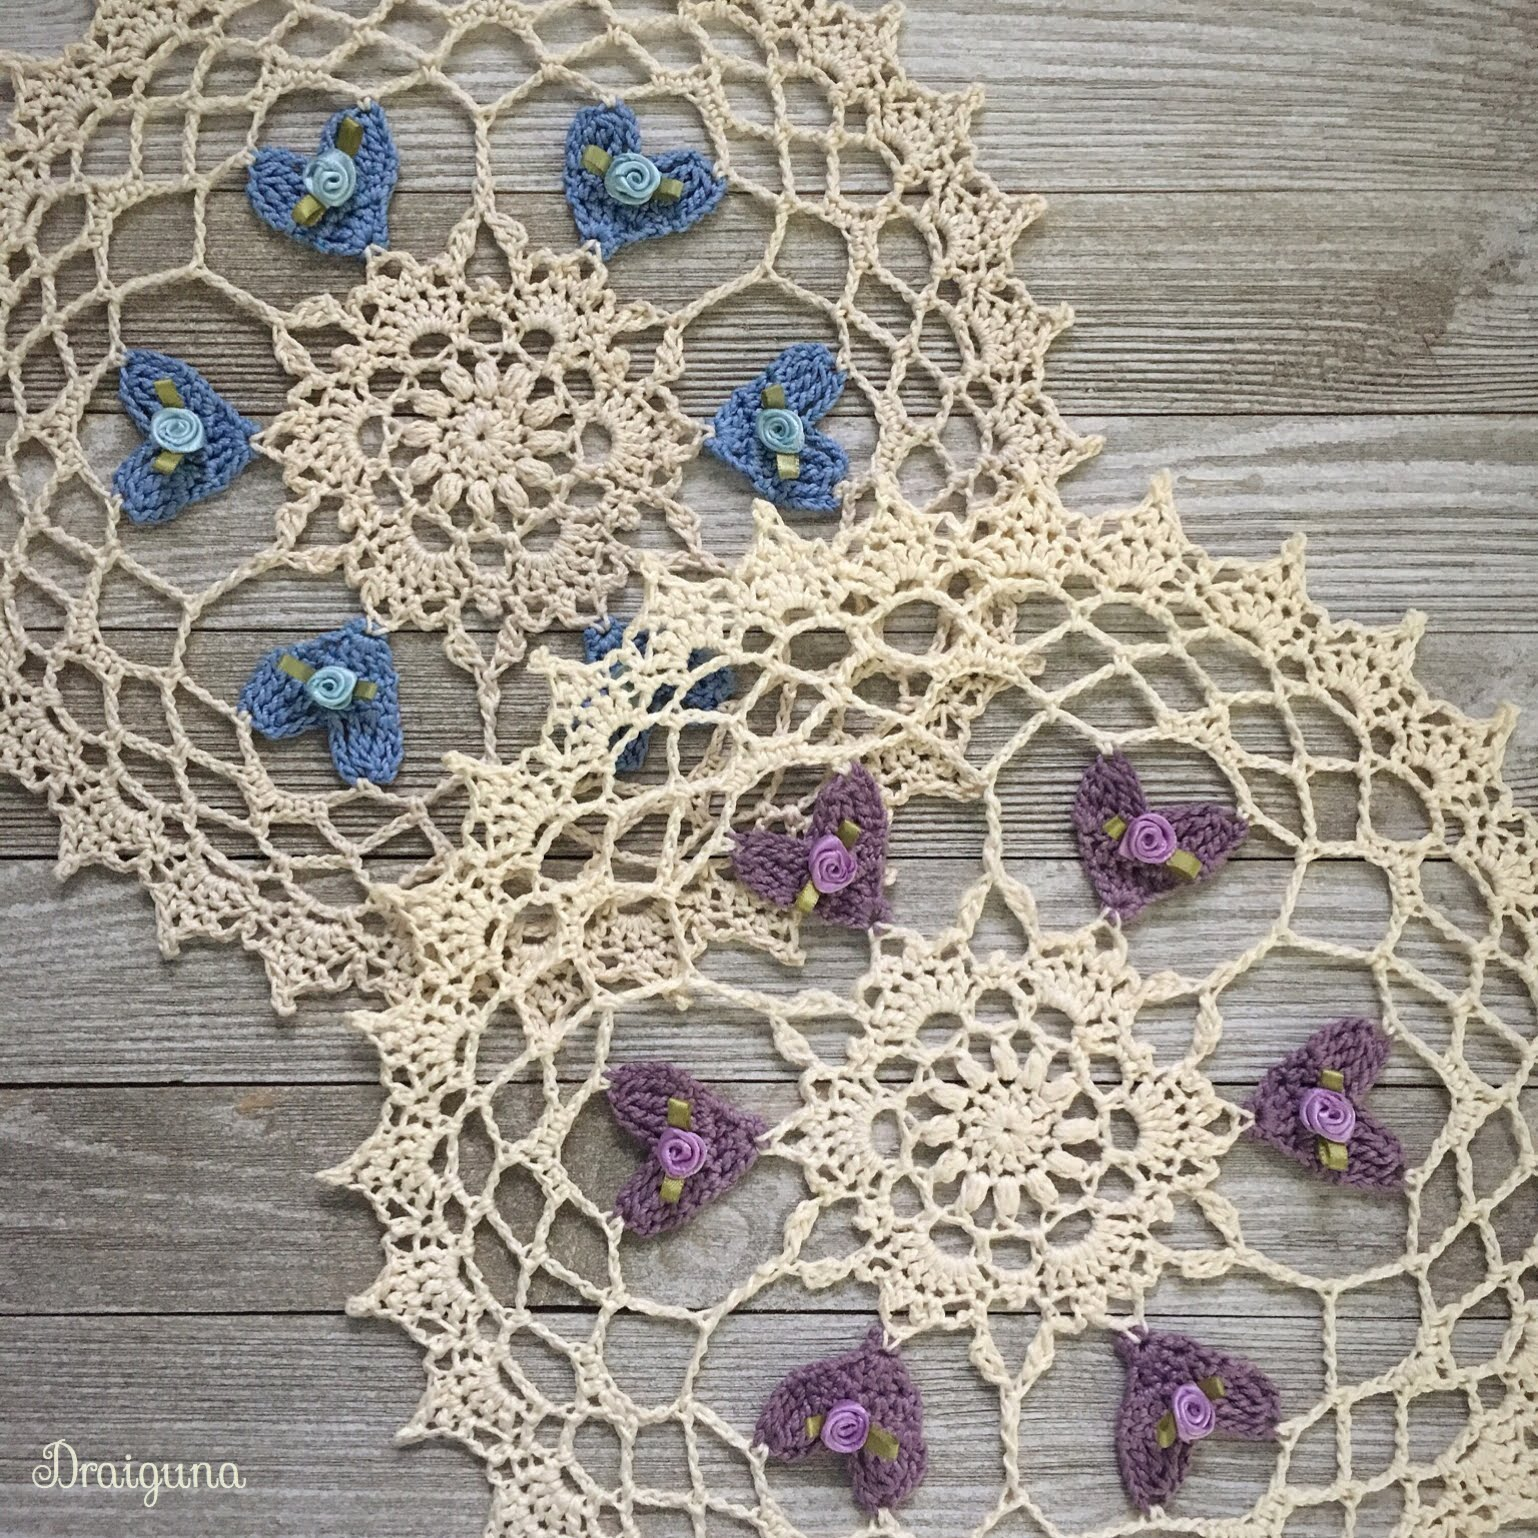 Free Crochet Pattern For Heartblossoms Doily ⋆ Crochet Kingdom